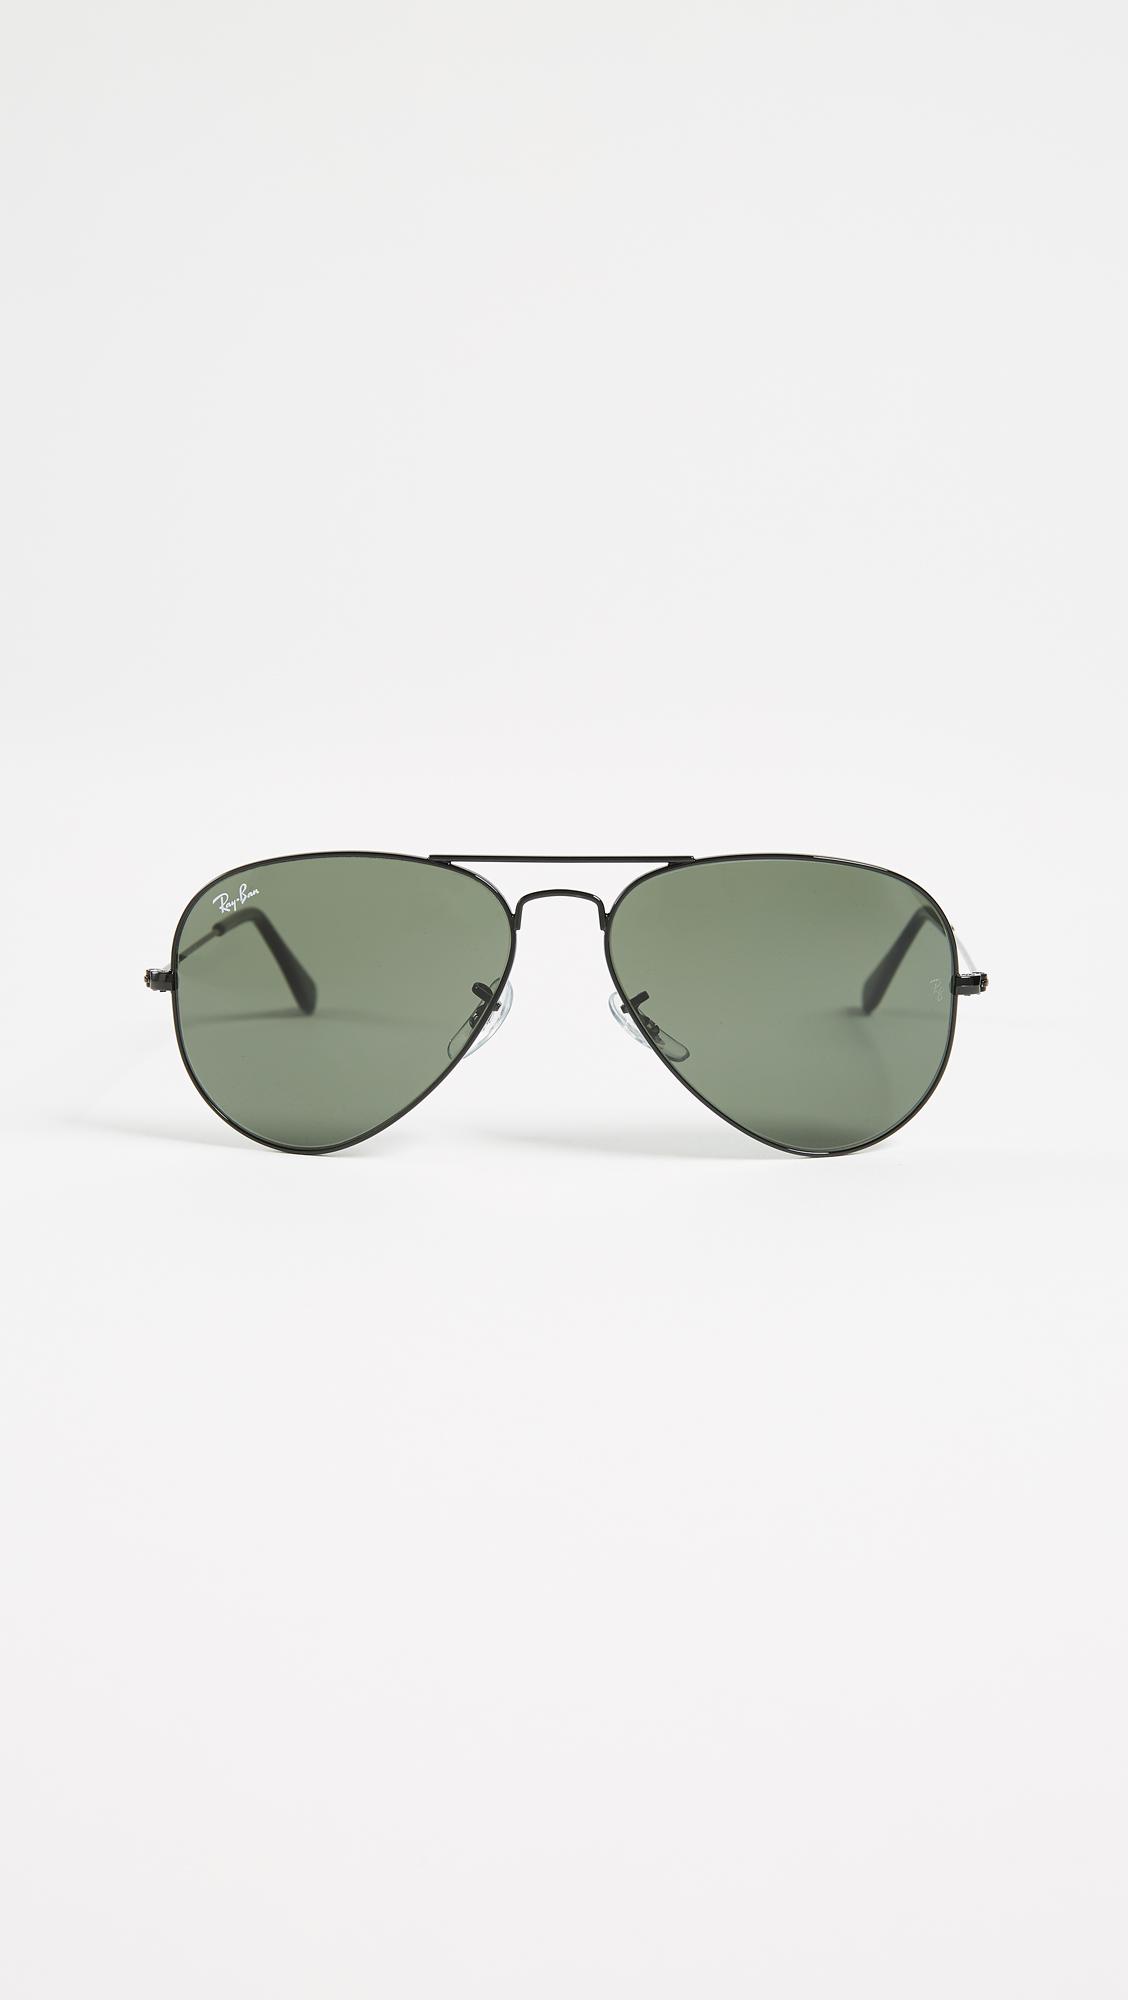 Ray-Ban Classic Aviator Sunglasses   SHOPBOP d298dc71f30d